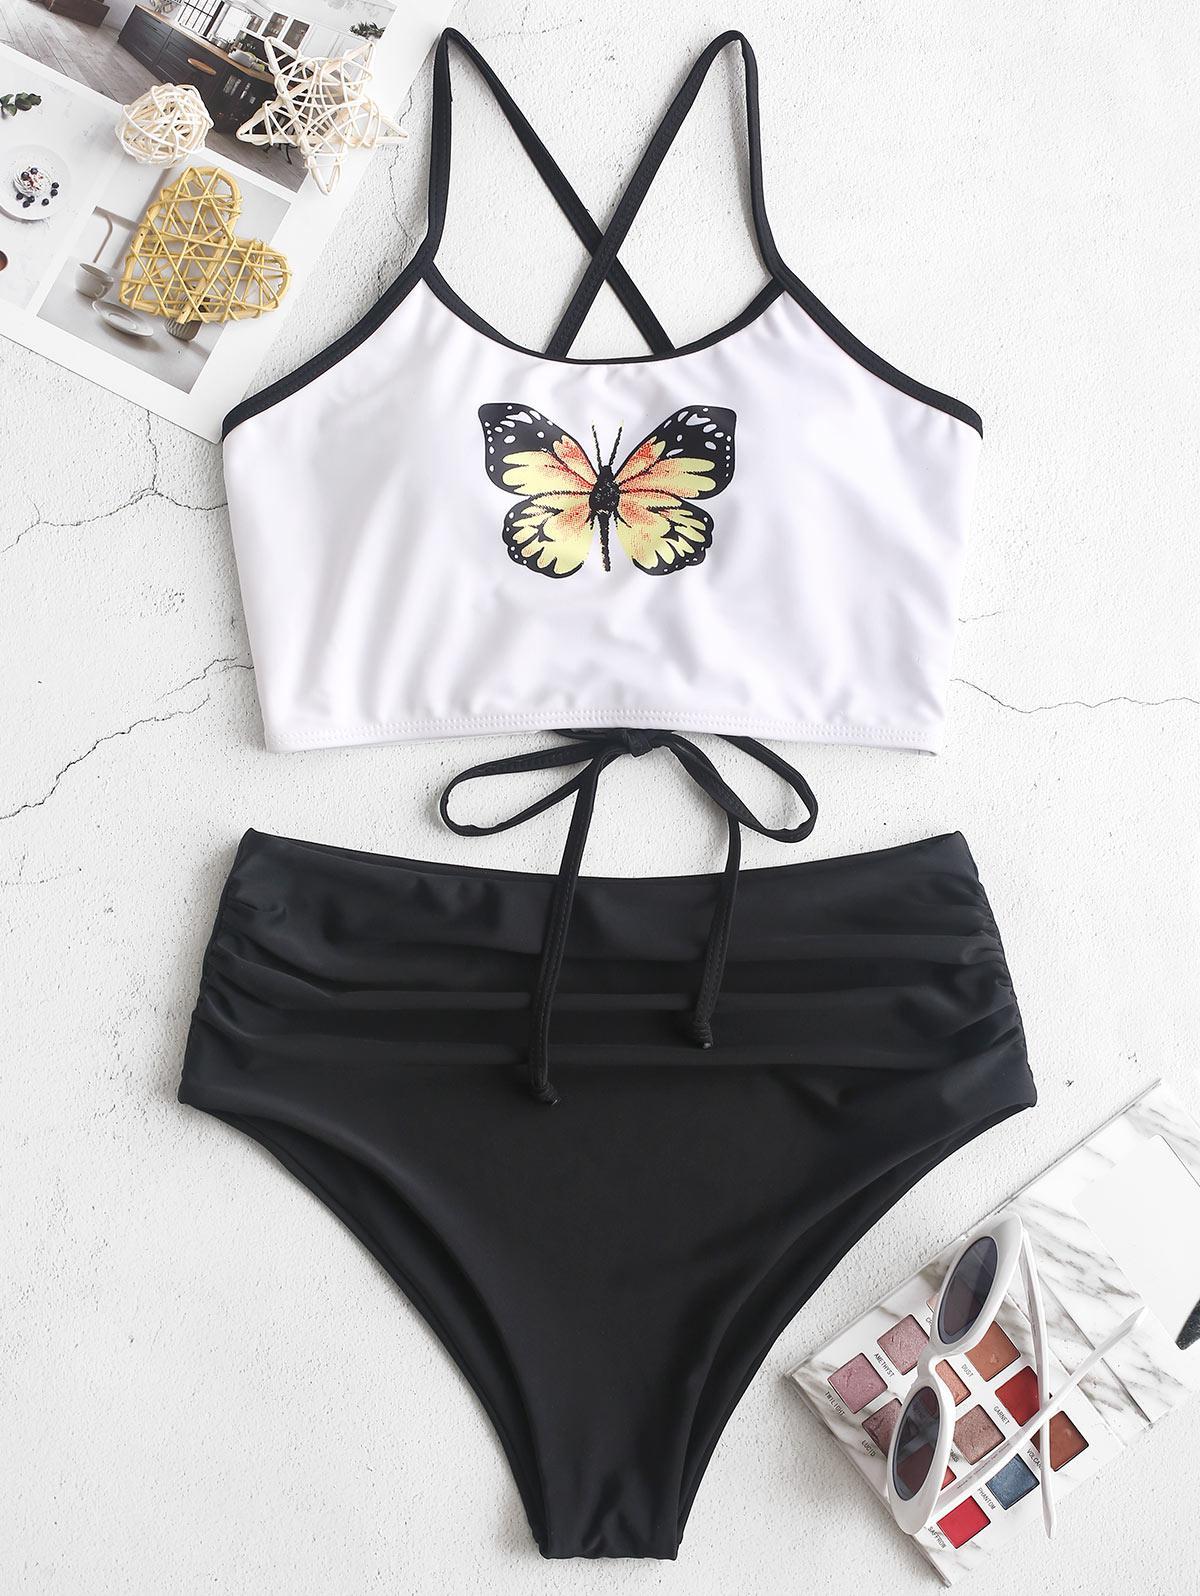 ZAFUL Butterfly Print Lace Up Tummy Control Tankini Swimsuit фото